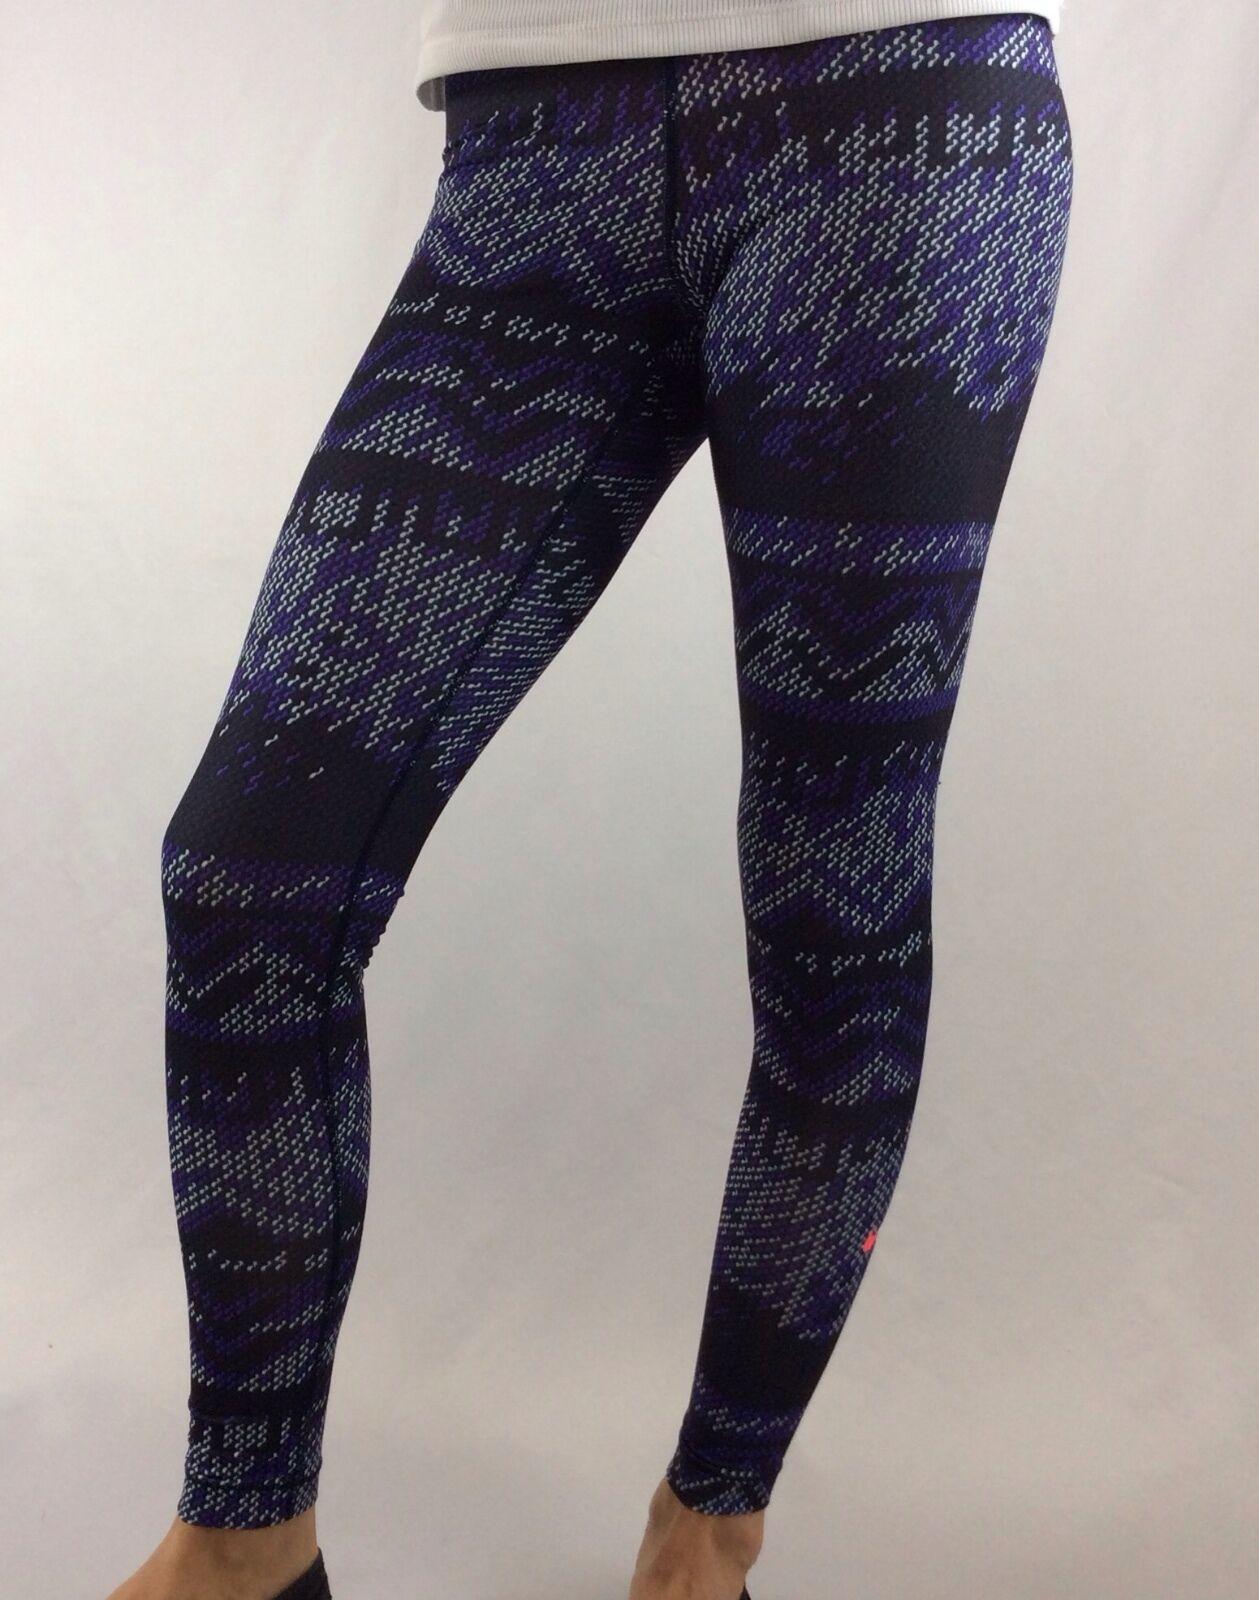 NIKE Pro Women's Athletic Training Tights Dri-Fit Purple White Size XS